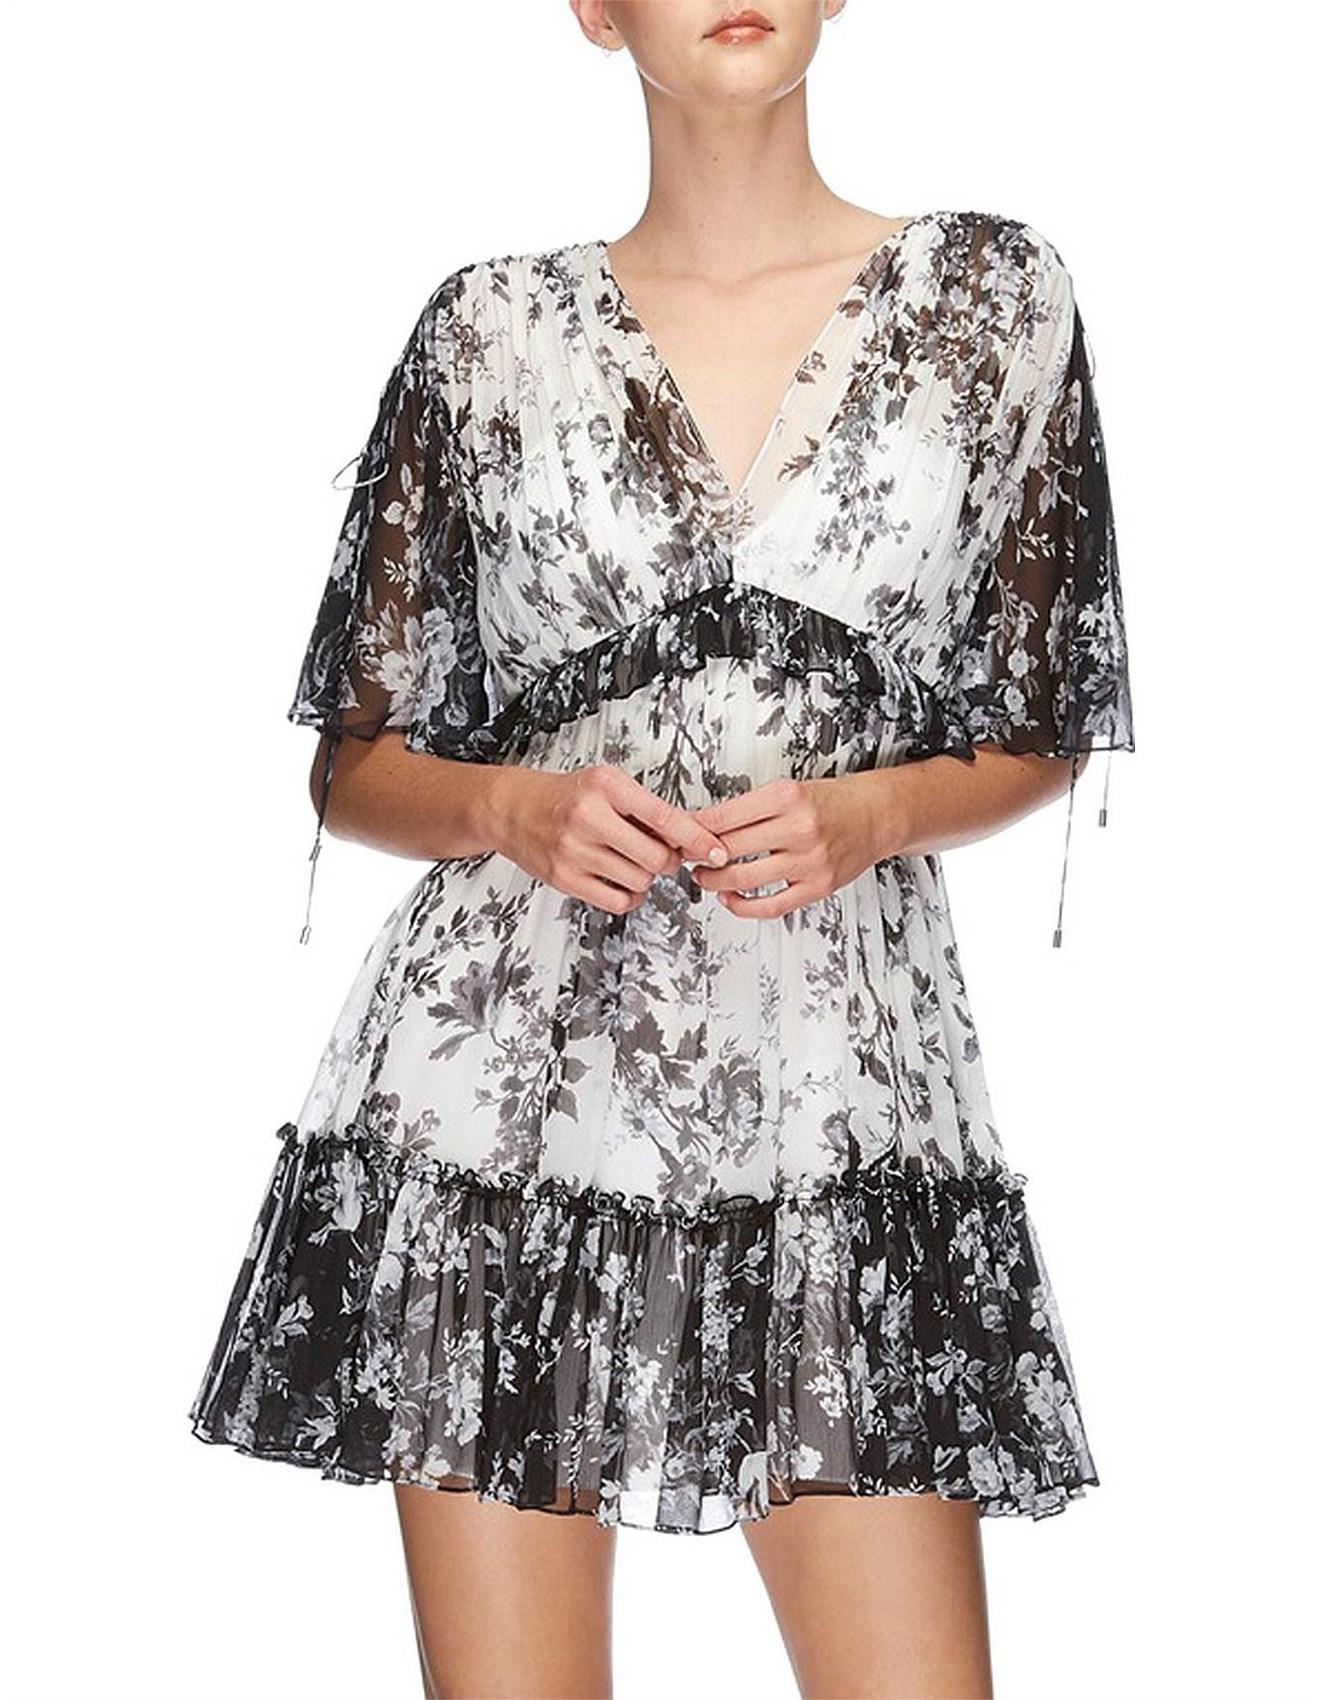 c9c6c22ec6c Midsummer Silk Mini Dress